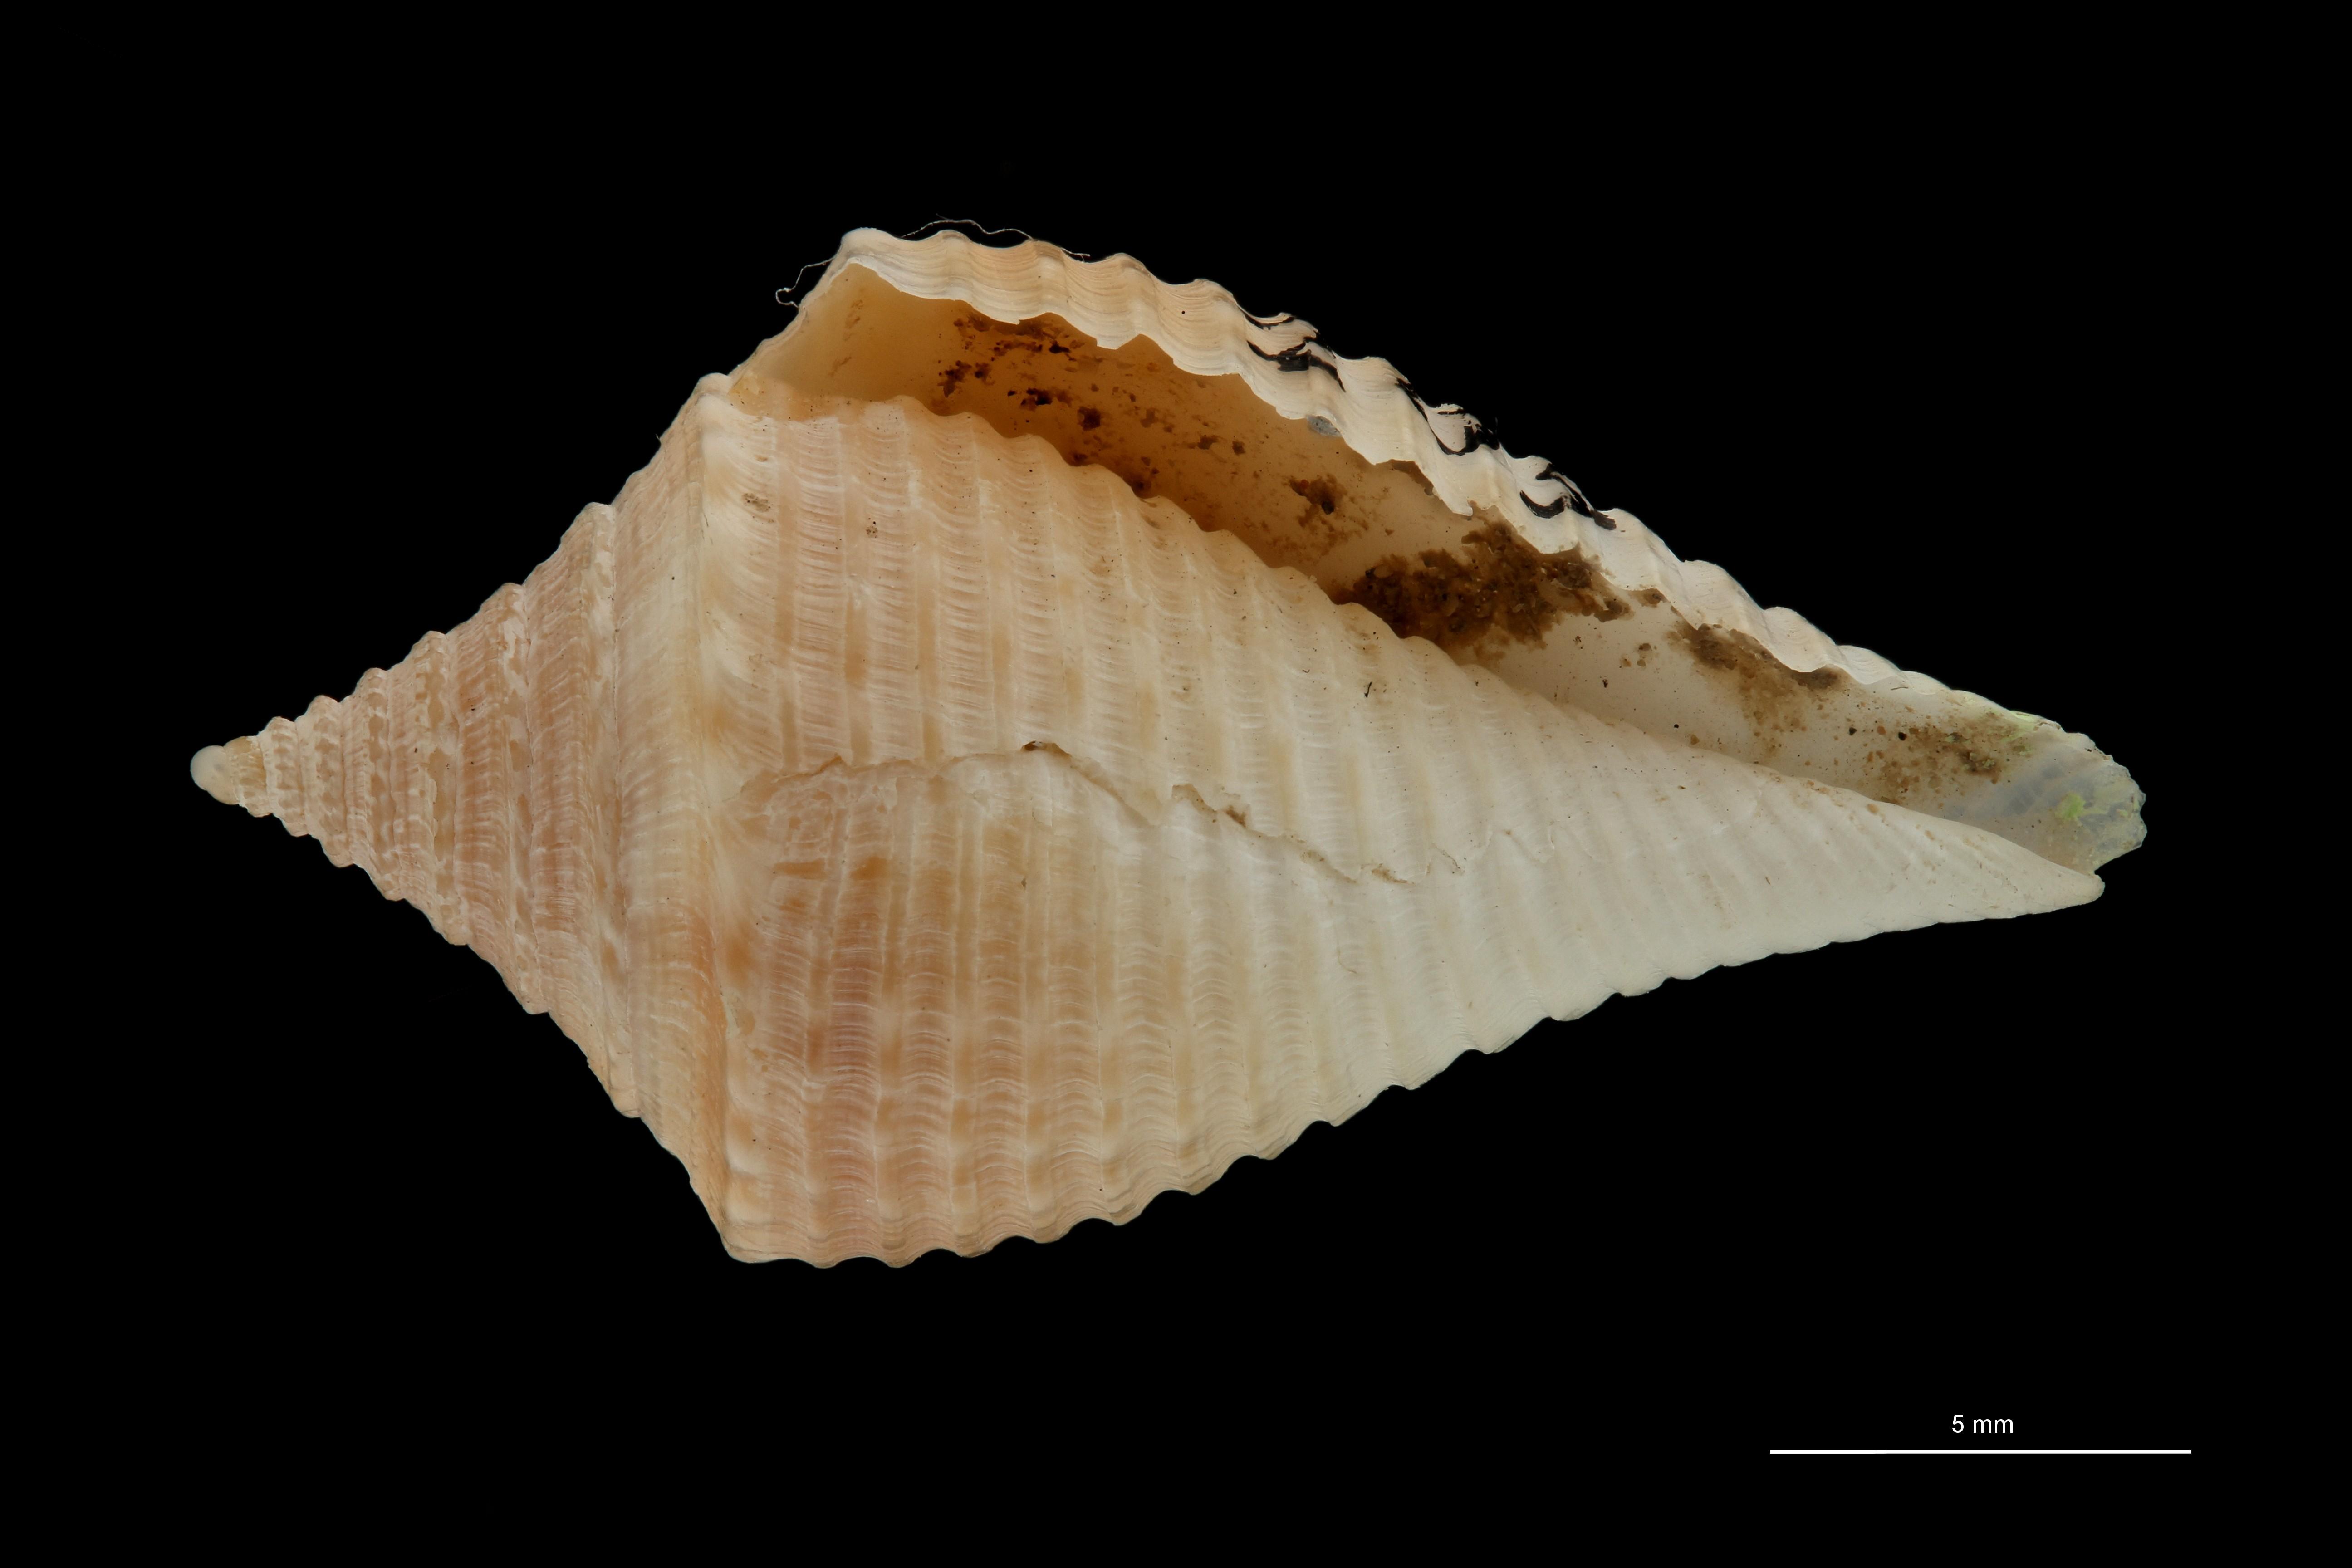 BE-RBINS-INV MT.3033 Conus guyanensis Pt V ZS PMax Scaled.jpg